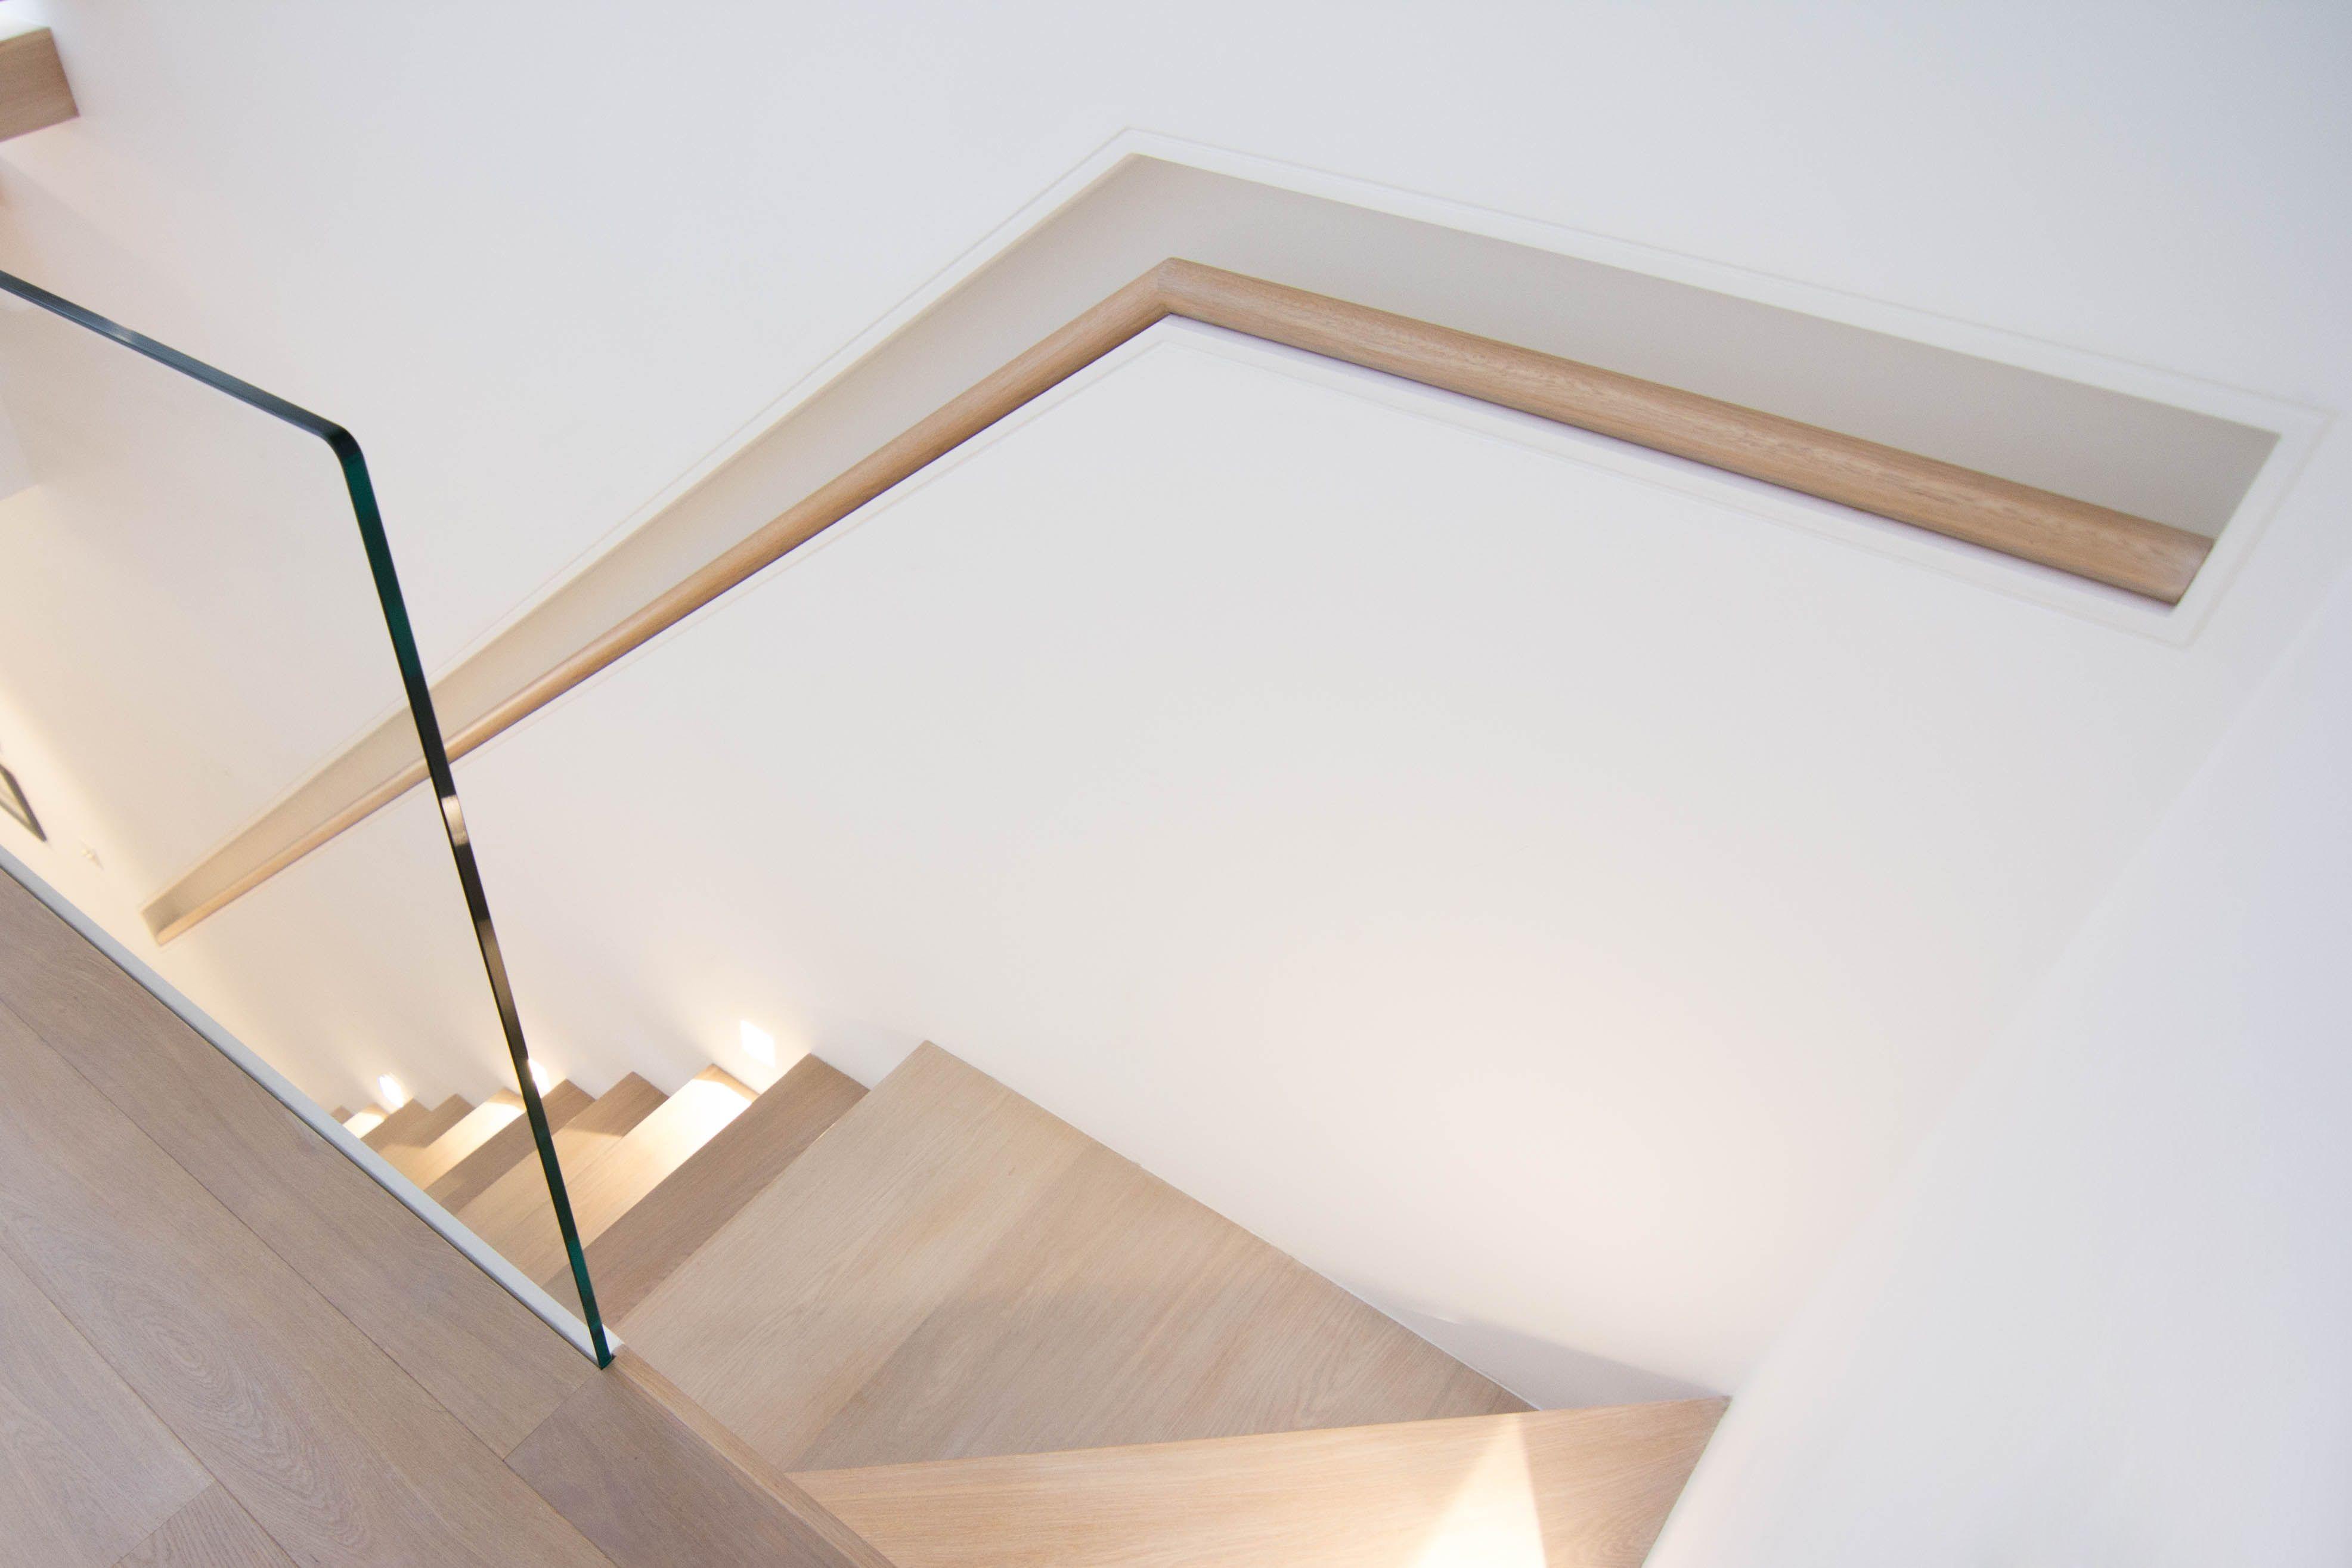 Handrail: 42mm Oak Round Profile Wall Mounted Handrail. Glass Balustrade, Wall  Mounted Handrail